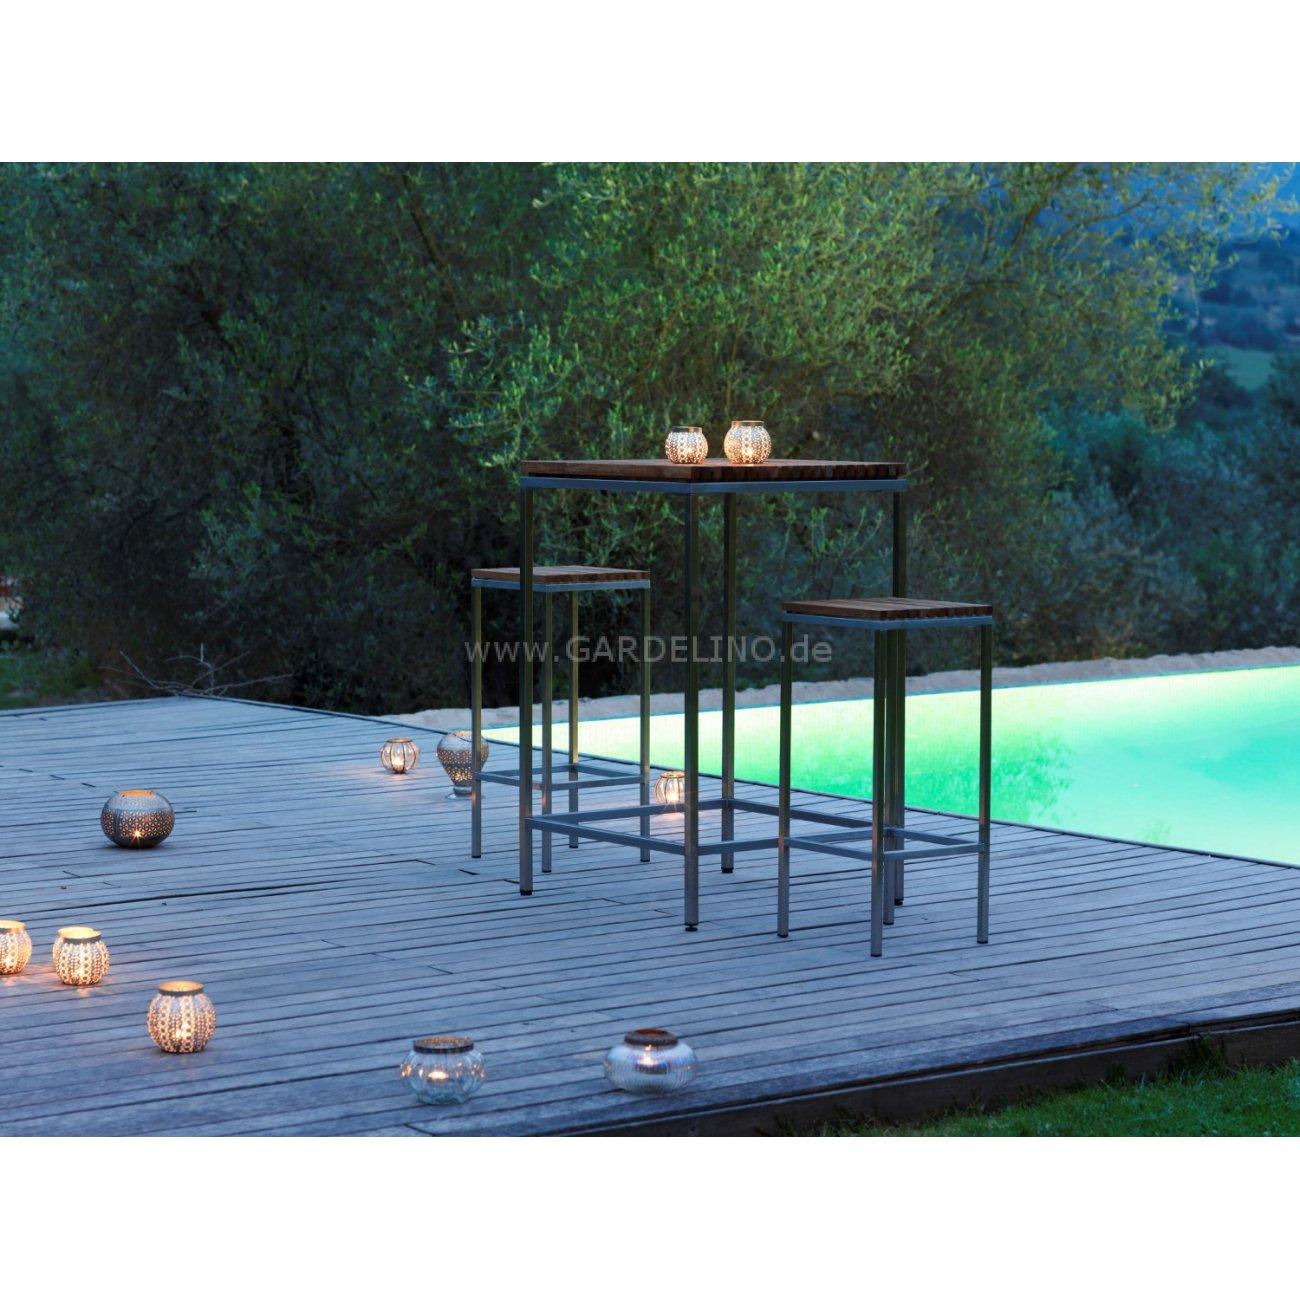 Gartenmobel Outlet Polyrattan : Viteo Home Teak Edelstahl Design Gartenmöbel